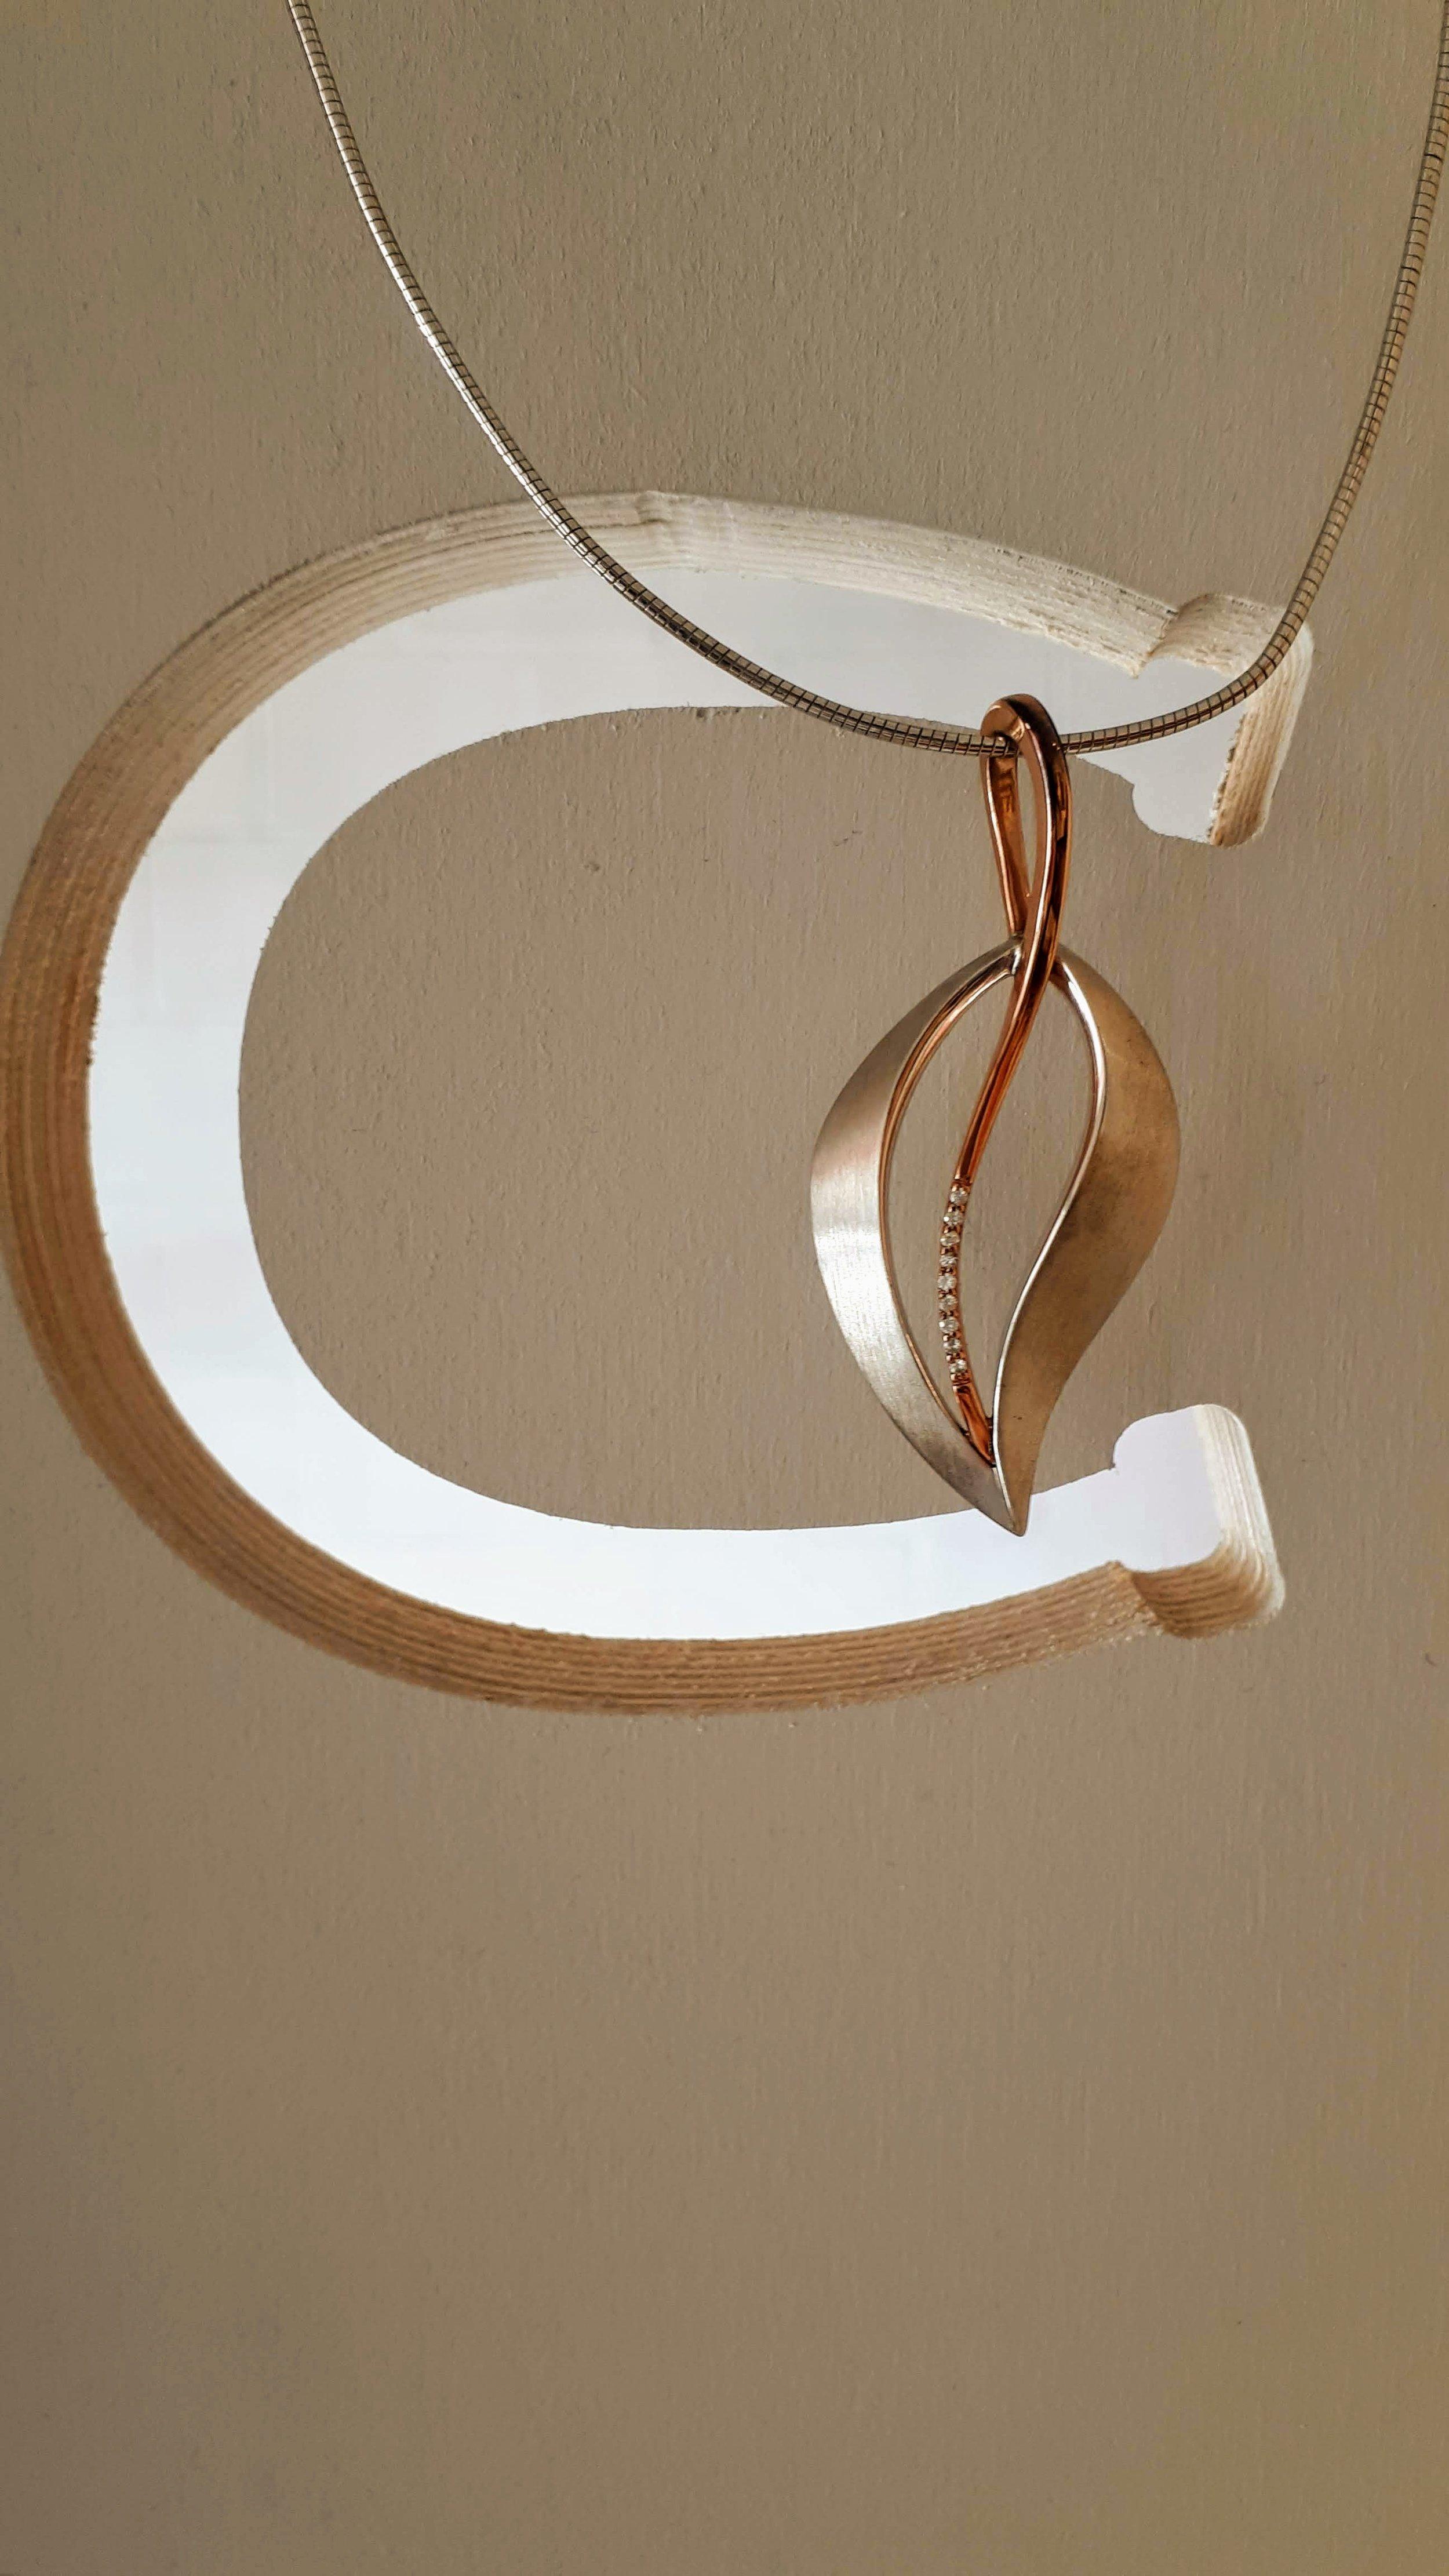 Breuning necklace $75